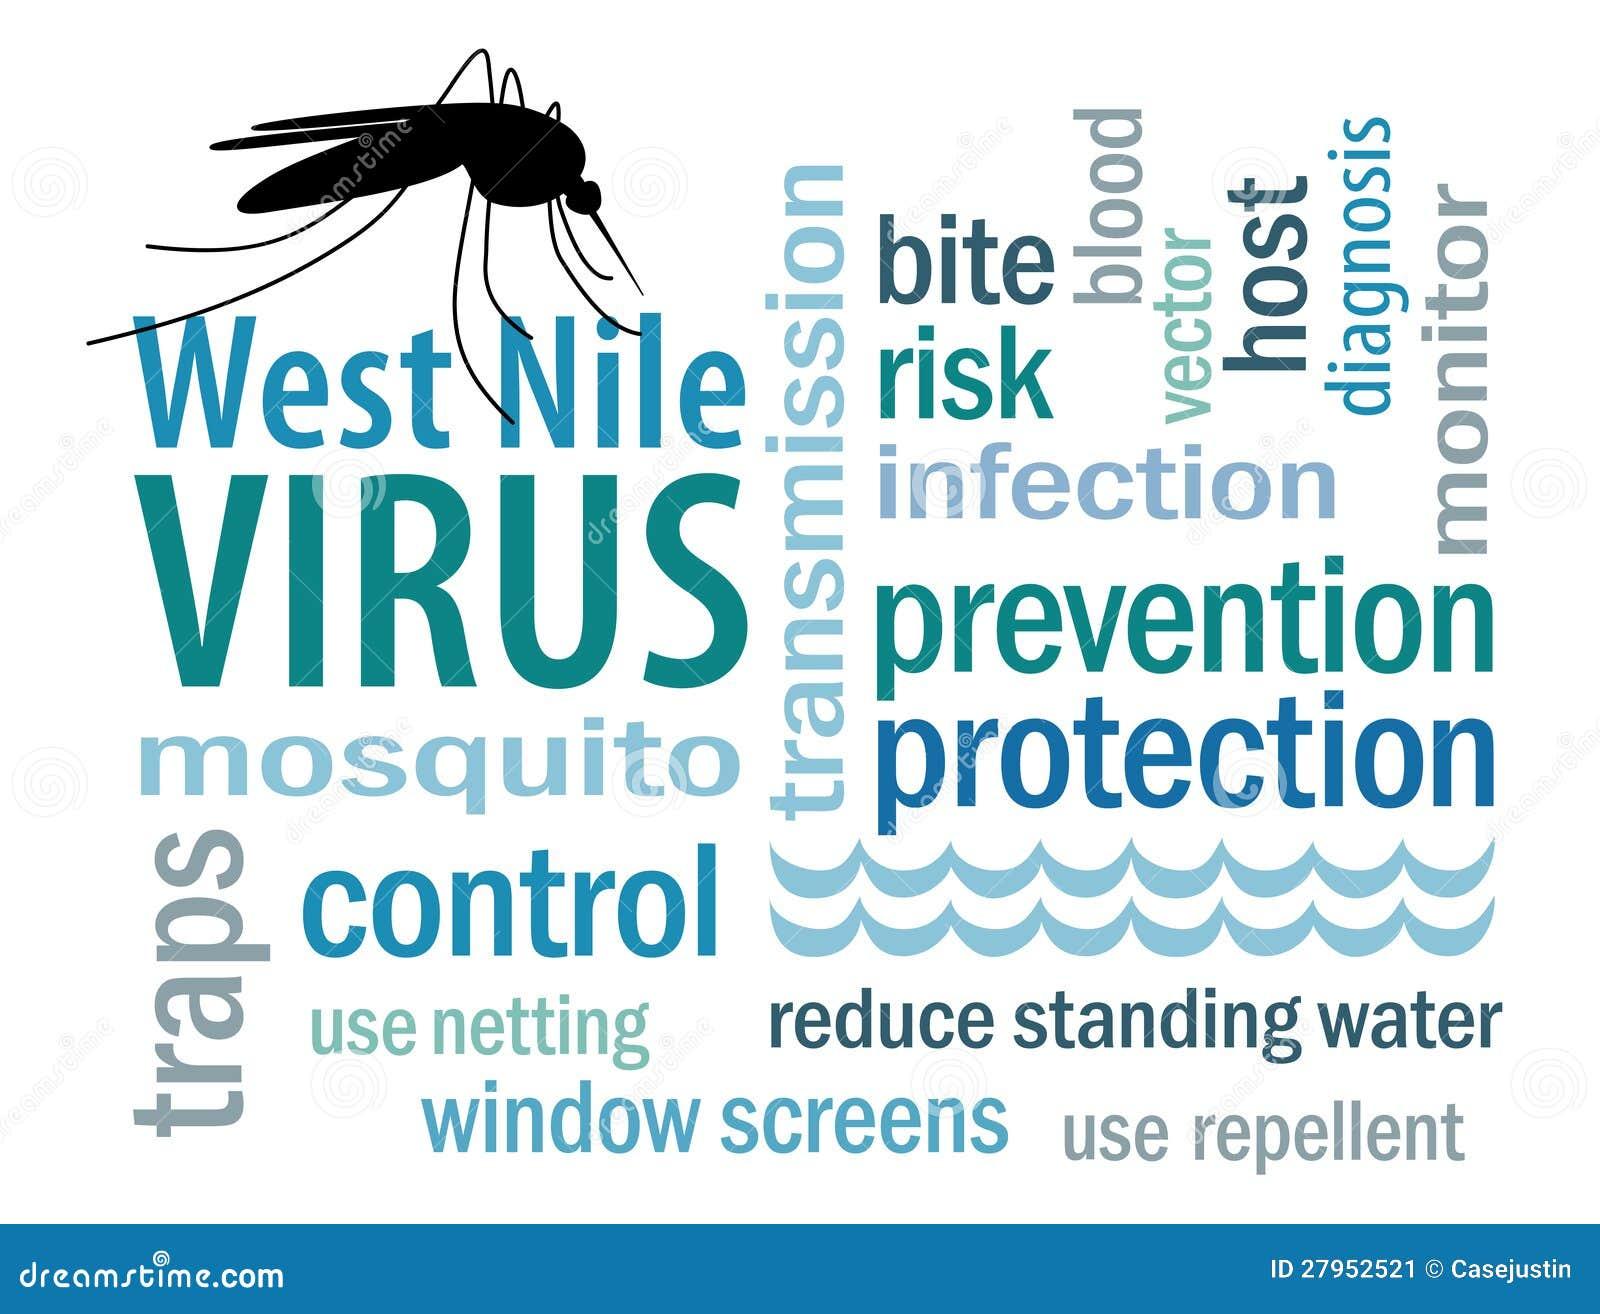 Viral Word: West Nile Virus Word Cloud Stock Vector. Illustration Of